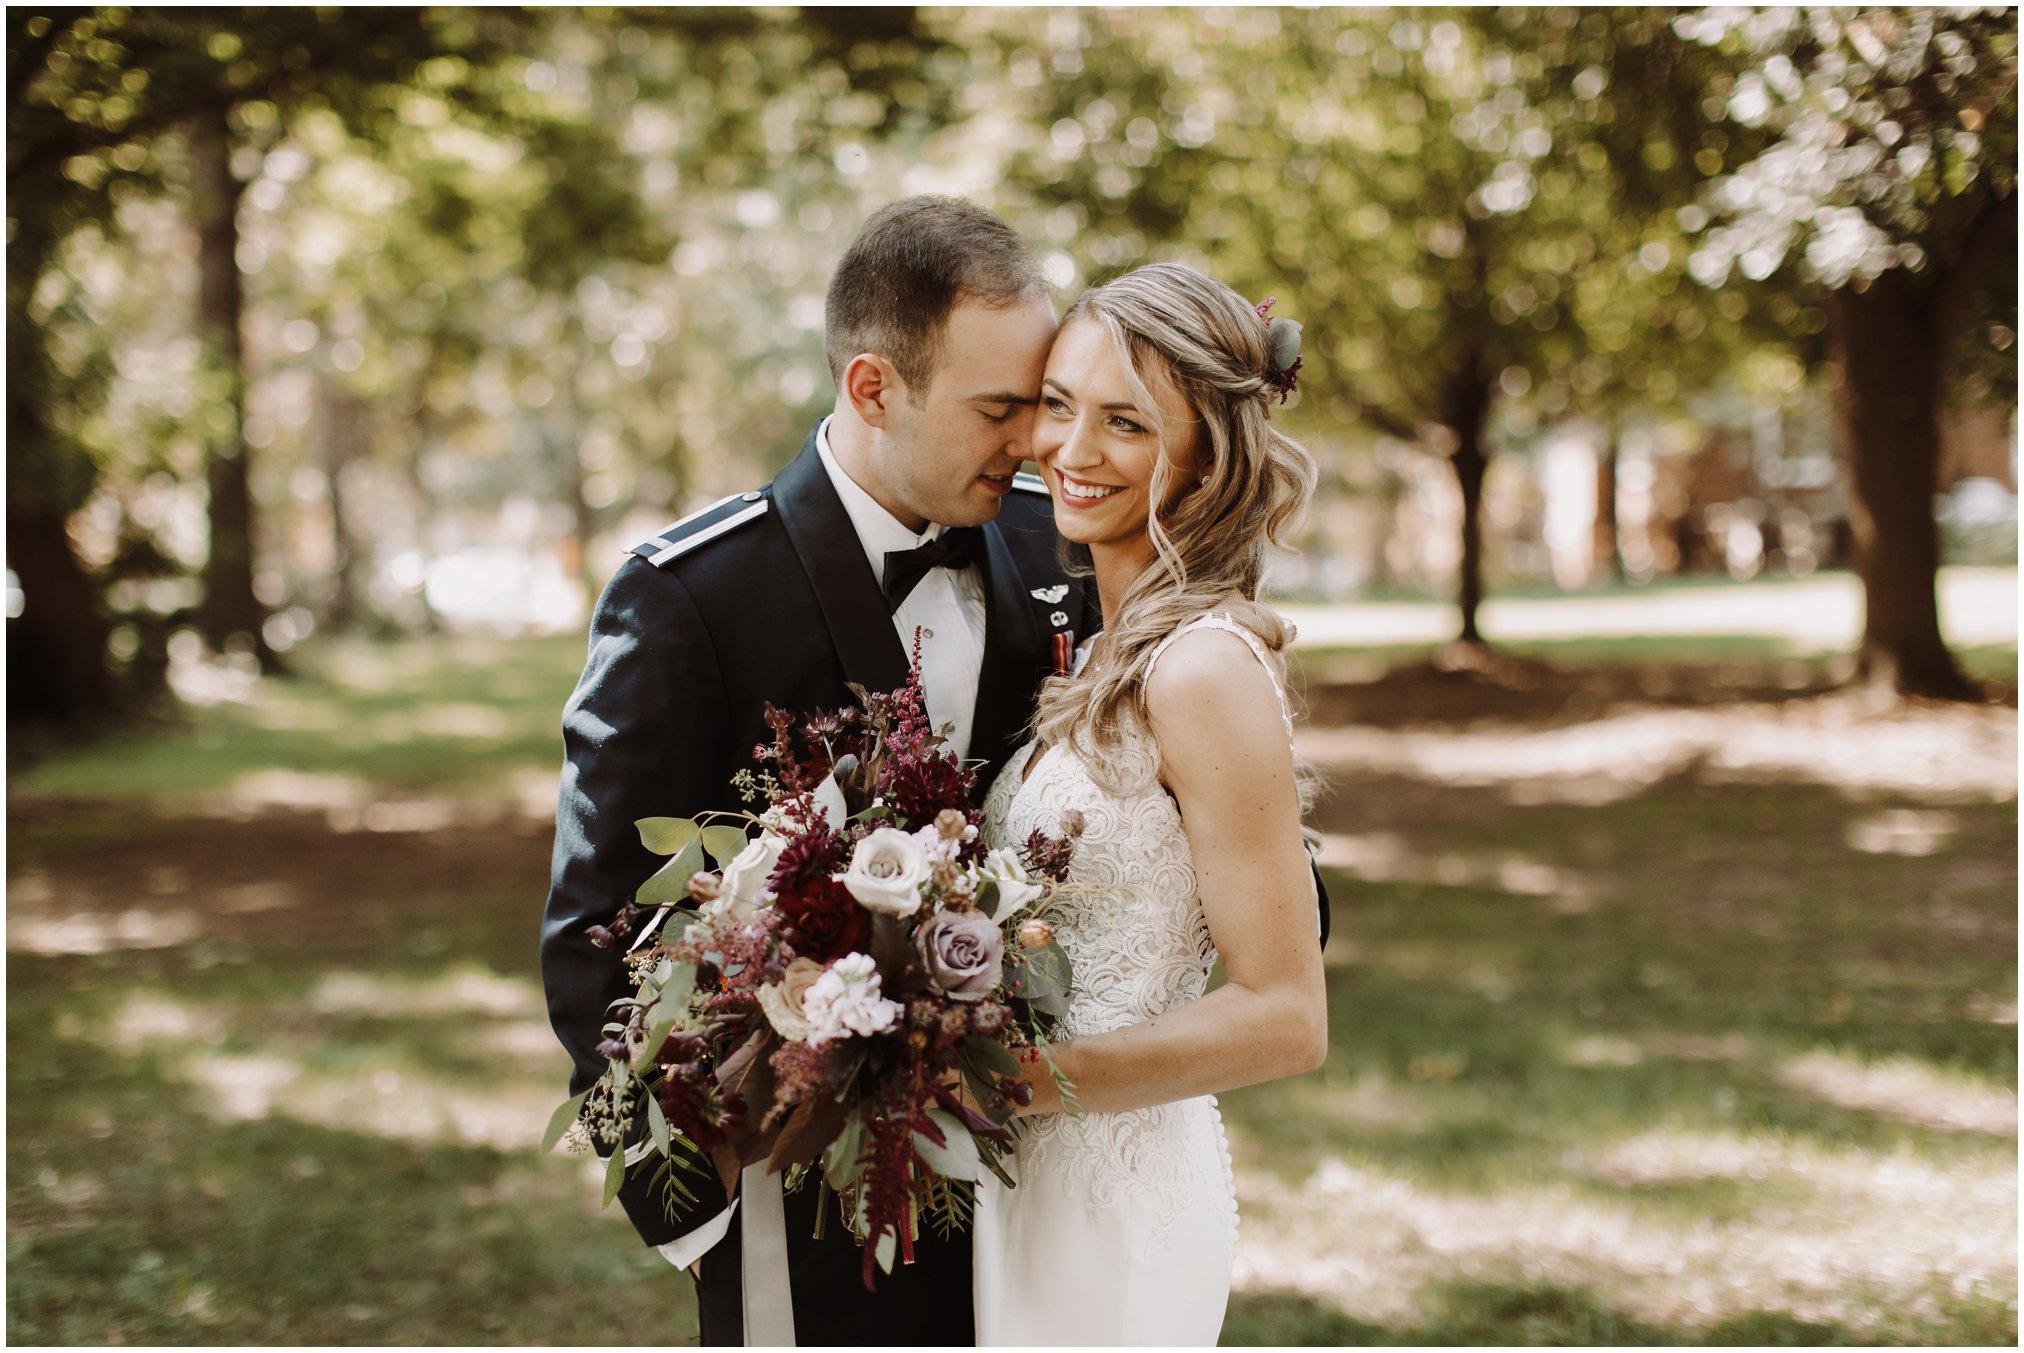 2019 Military Air Force Wedding Photos